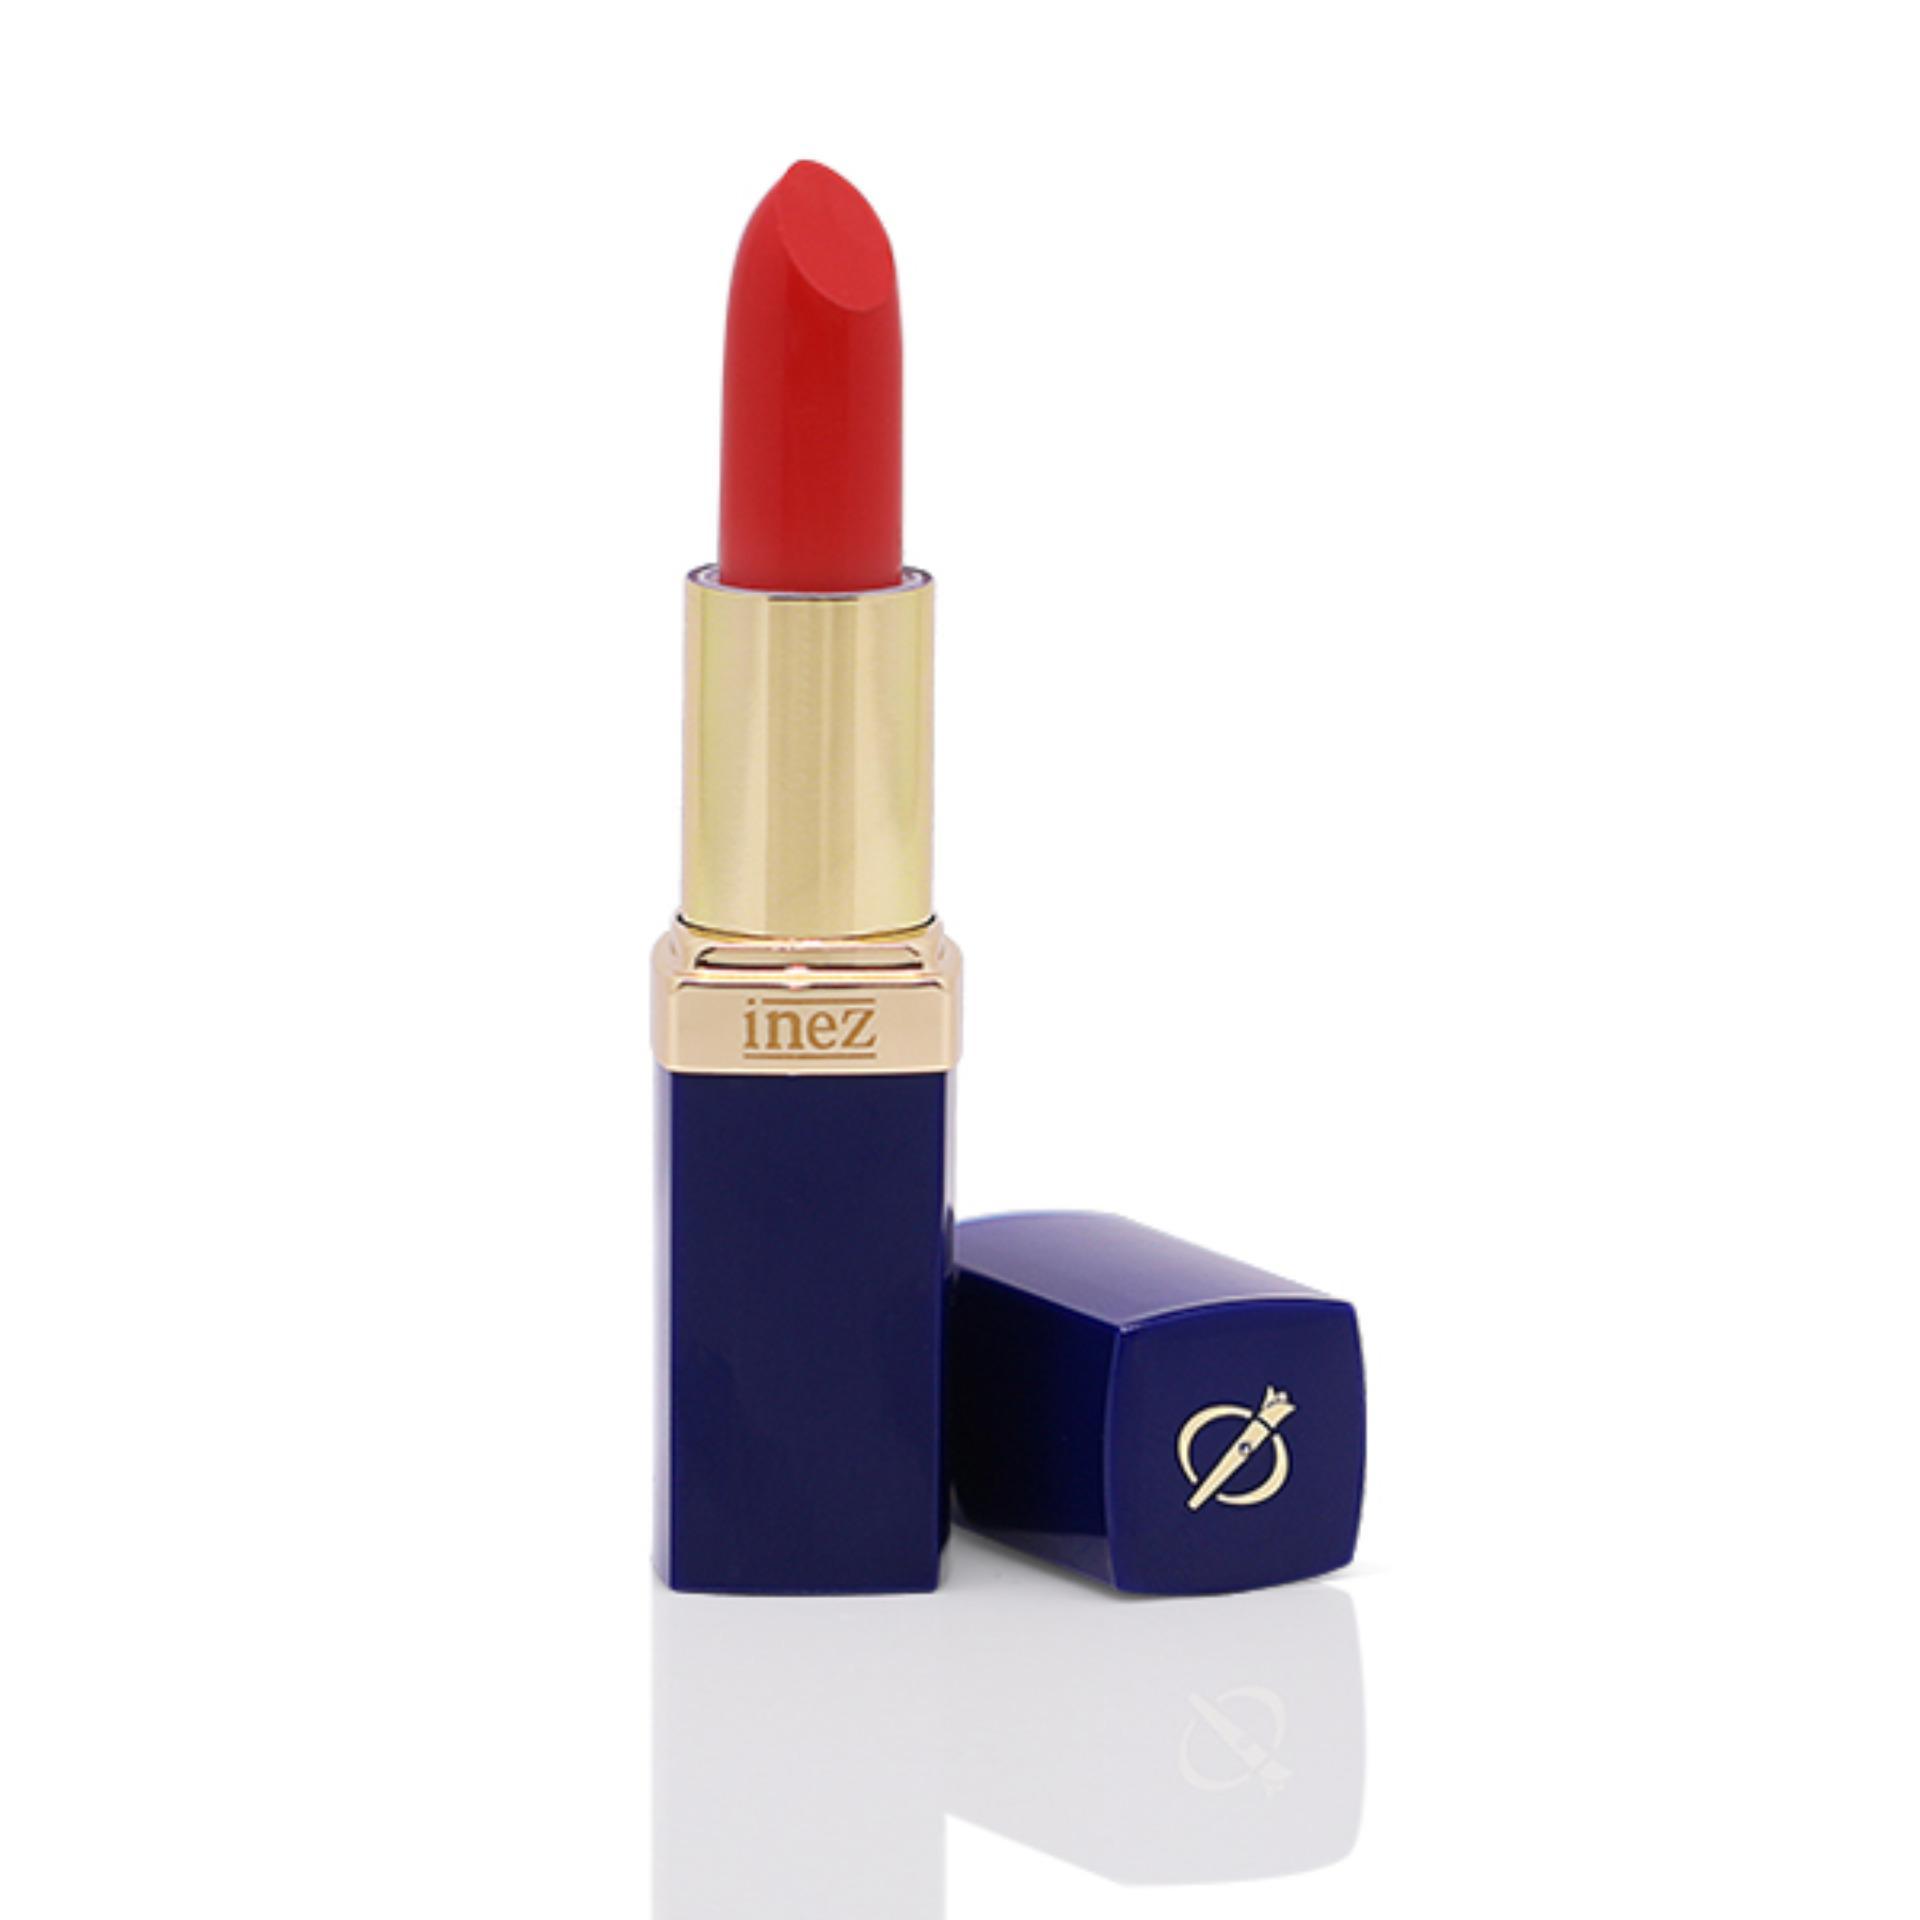 Inez Colour Contour Plus Lipstick - True Red